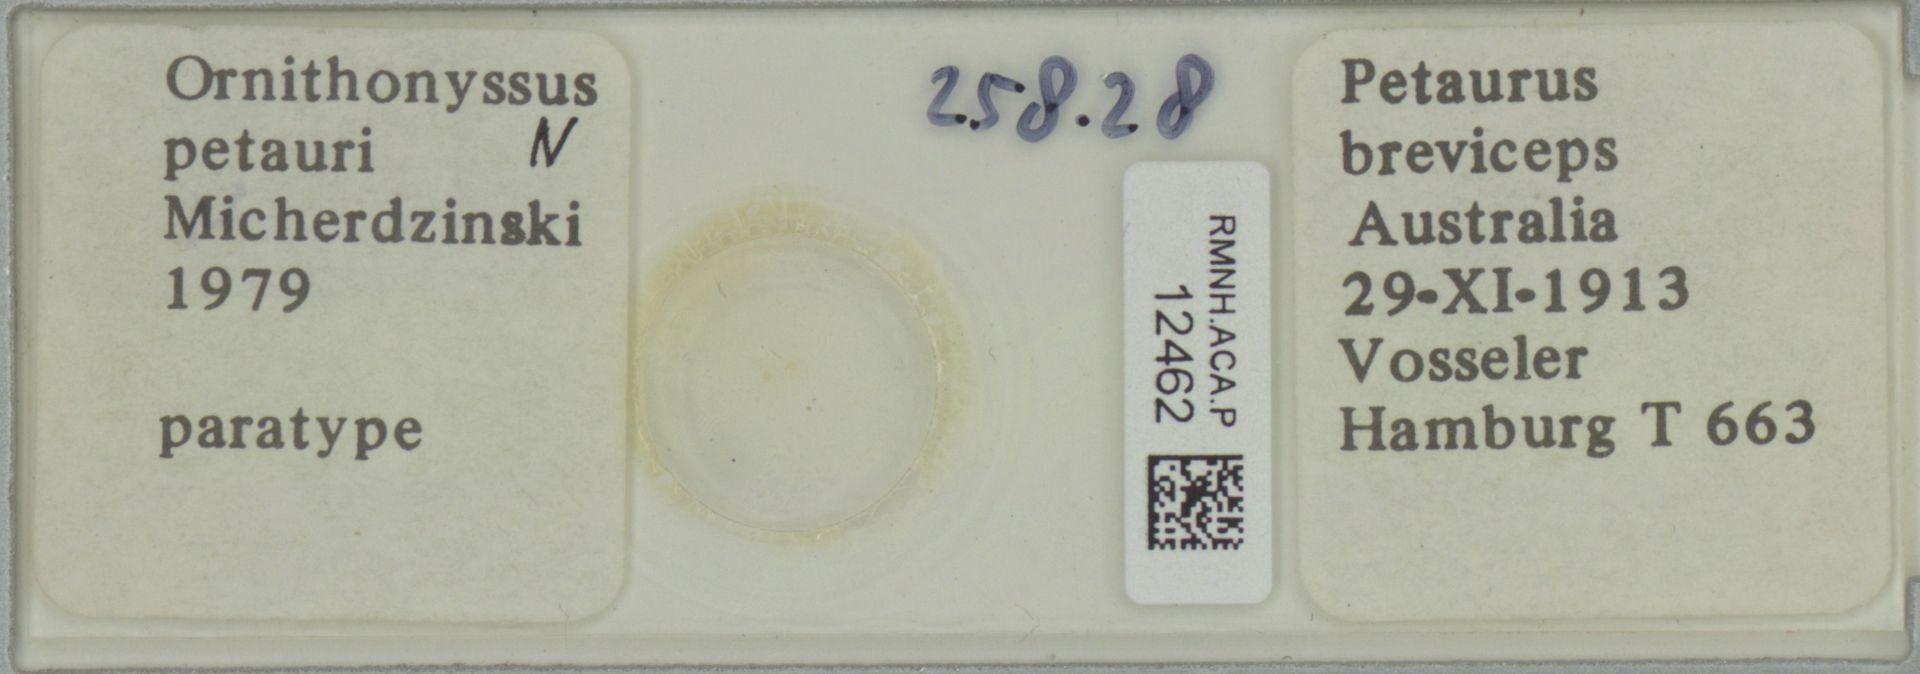 RMNH.ACA.P.12462   Ornithonyssus petauri Micherdzinski 1979